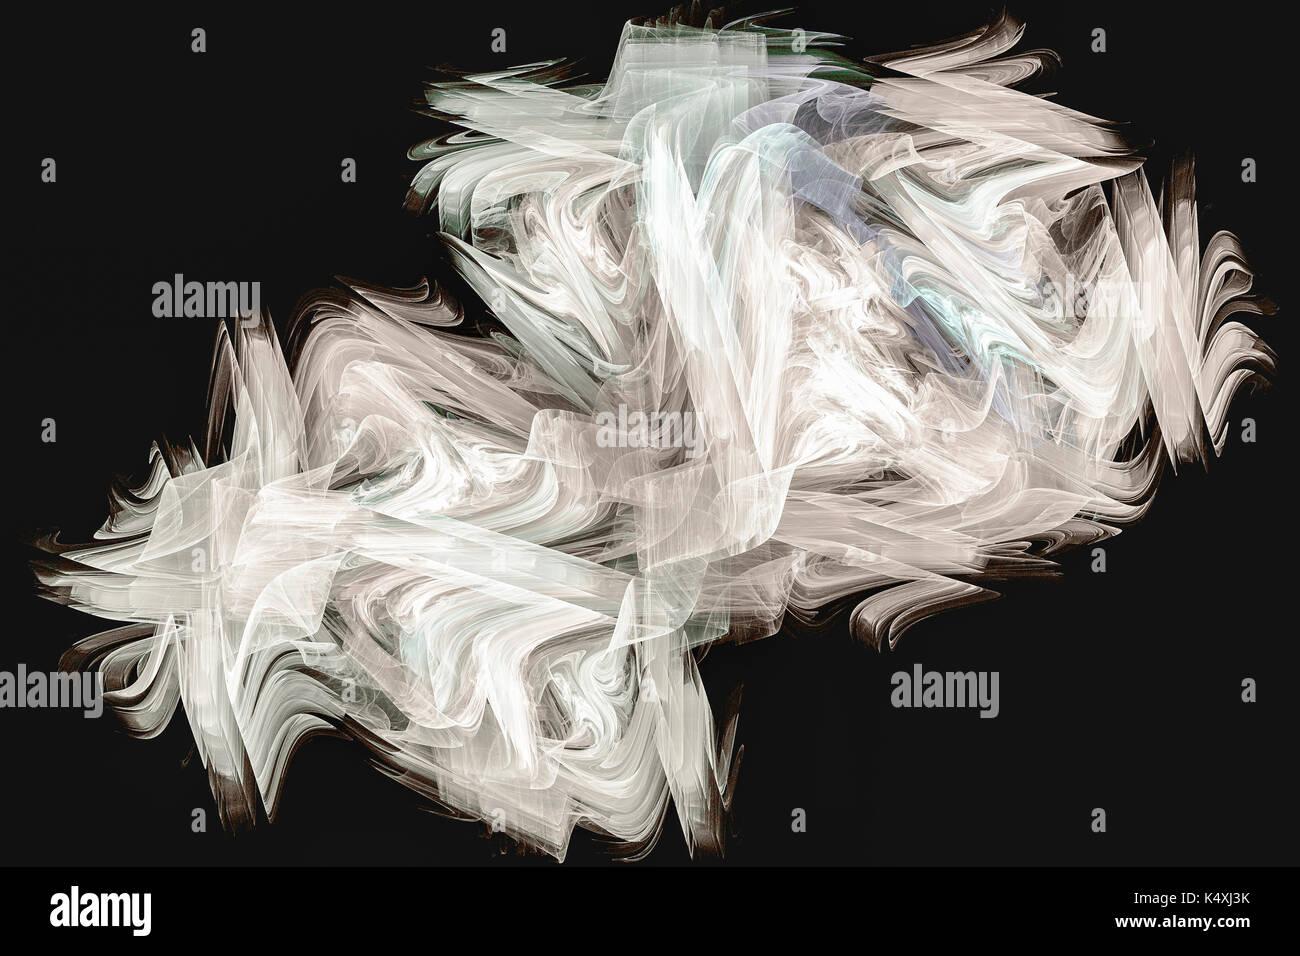 Geprägtes Leinen Seide Filamente - Digital Design Stockbild